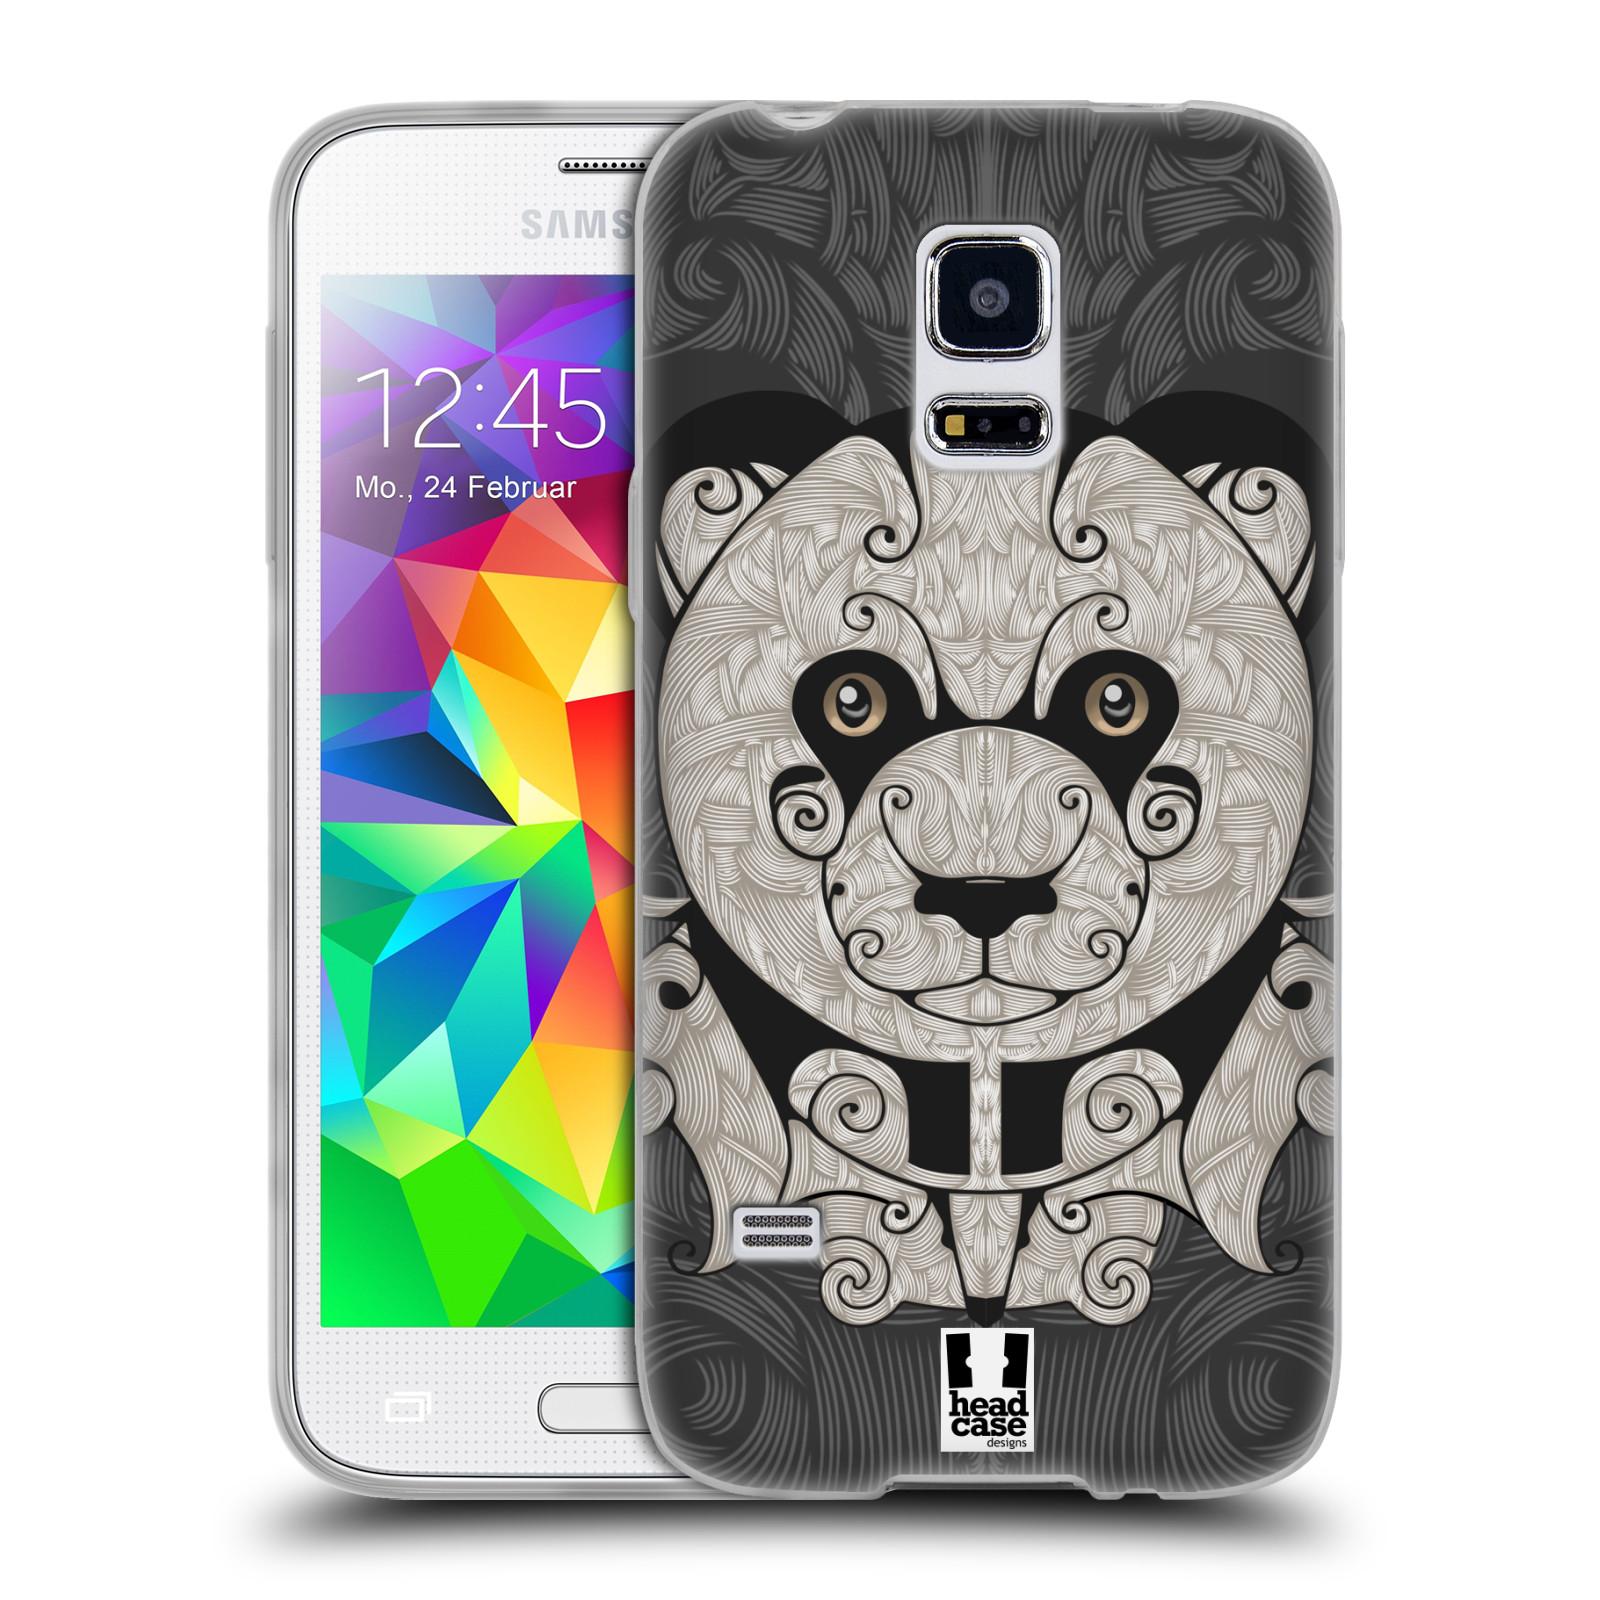 HEAD CASE silikonový obal na mobil Samsung Galaxy S5 MINI vzor kudrlinky zvíře panda